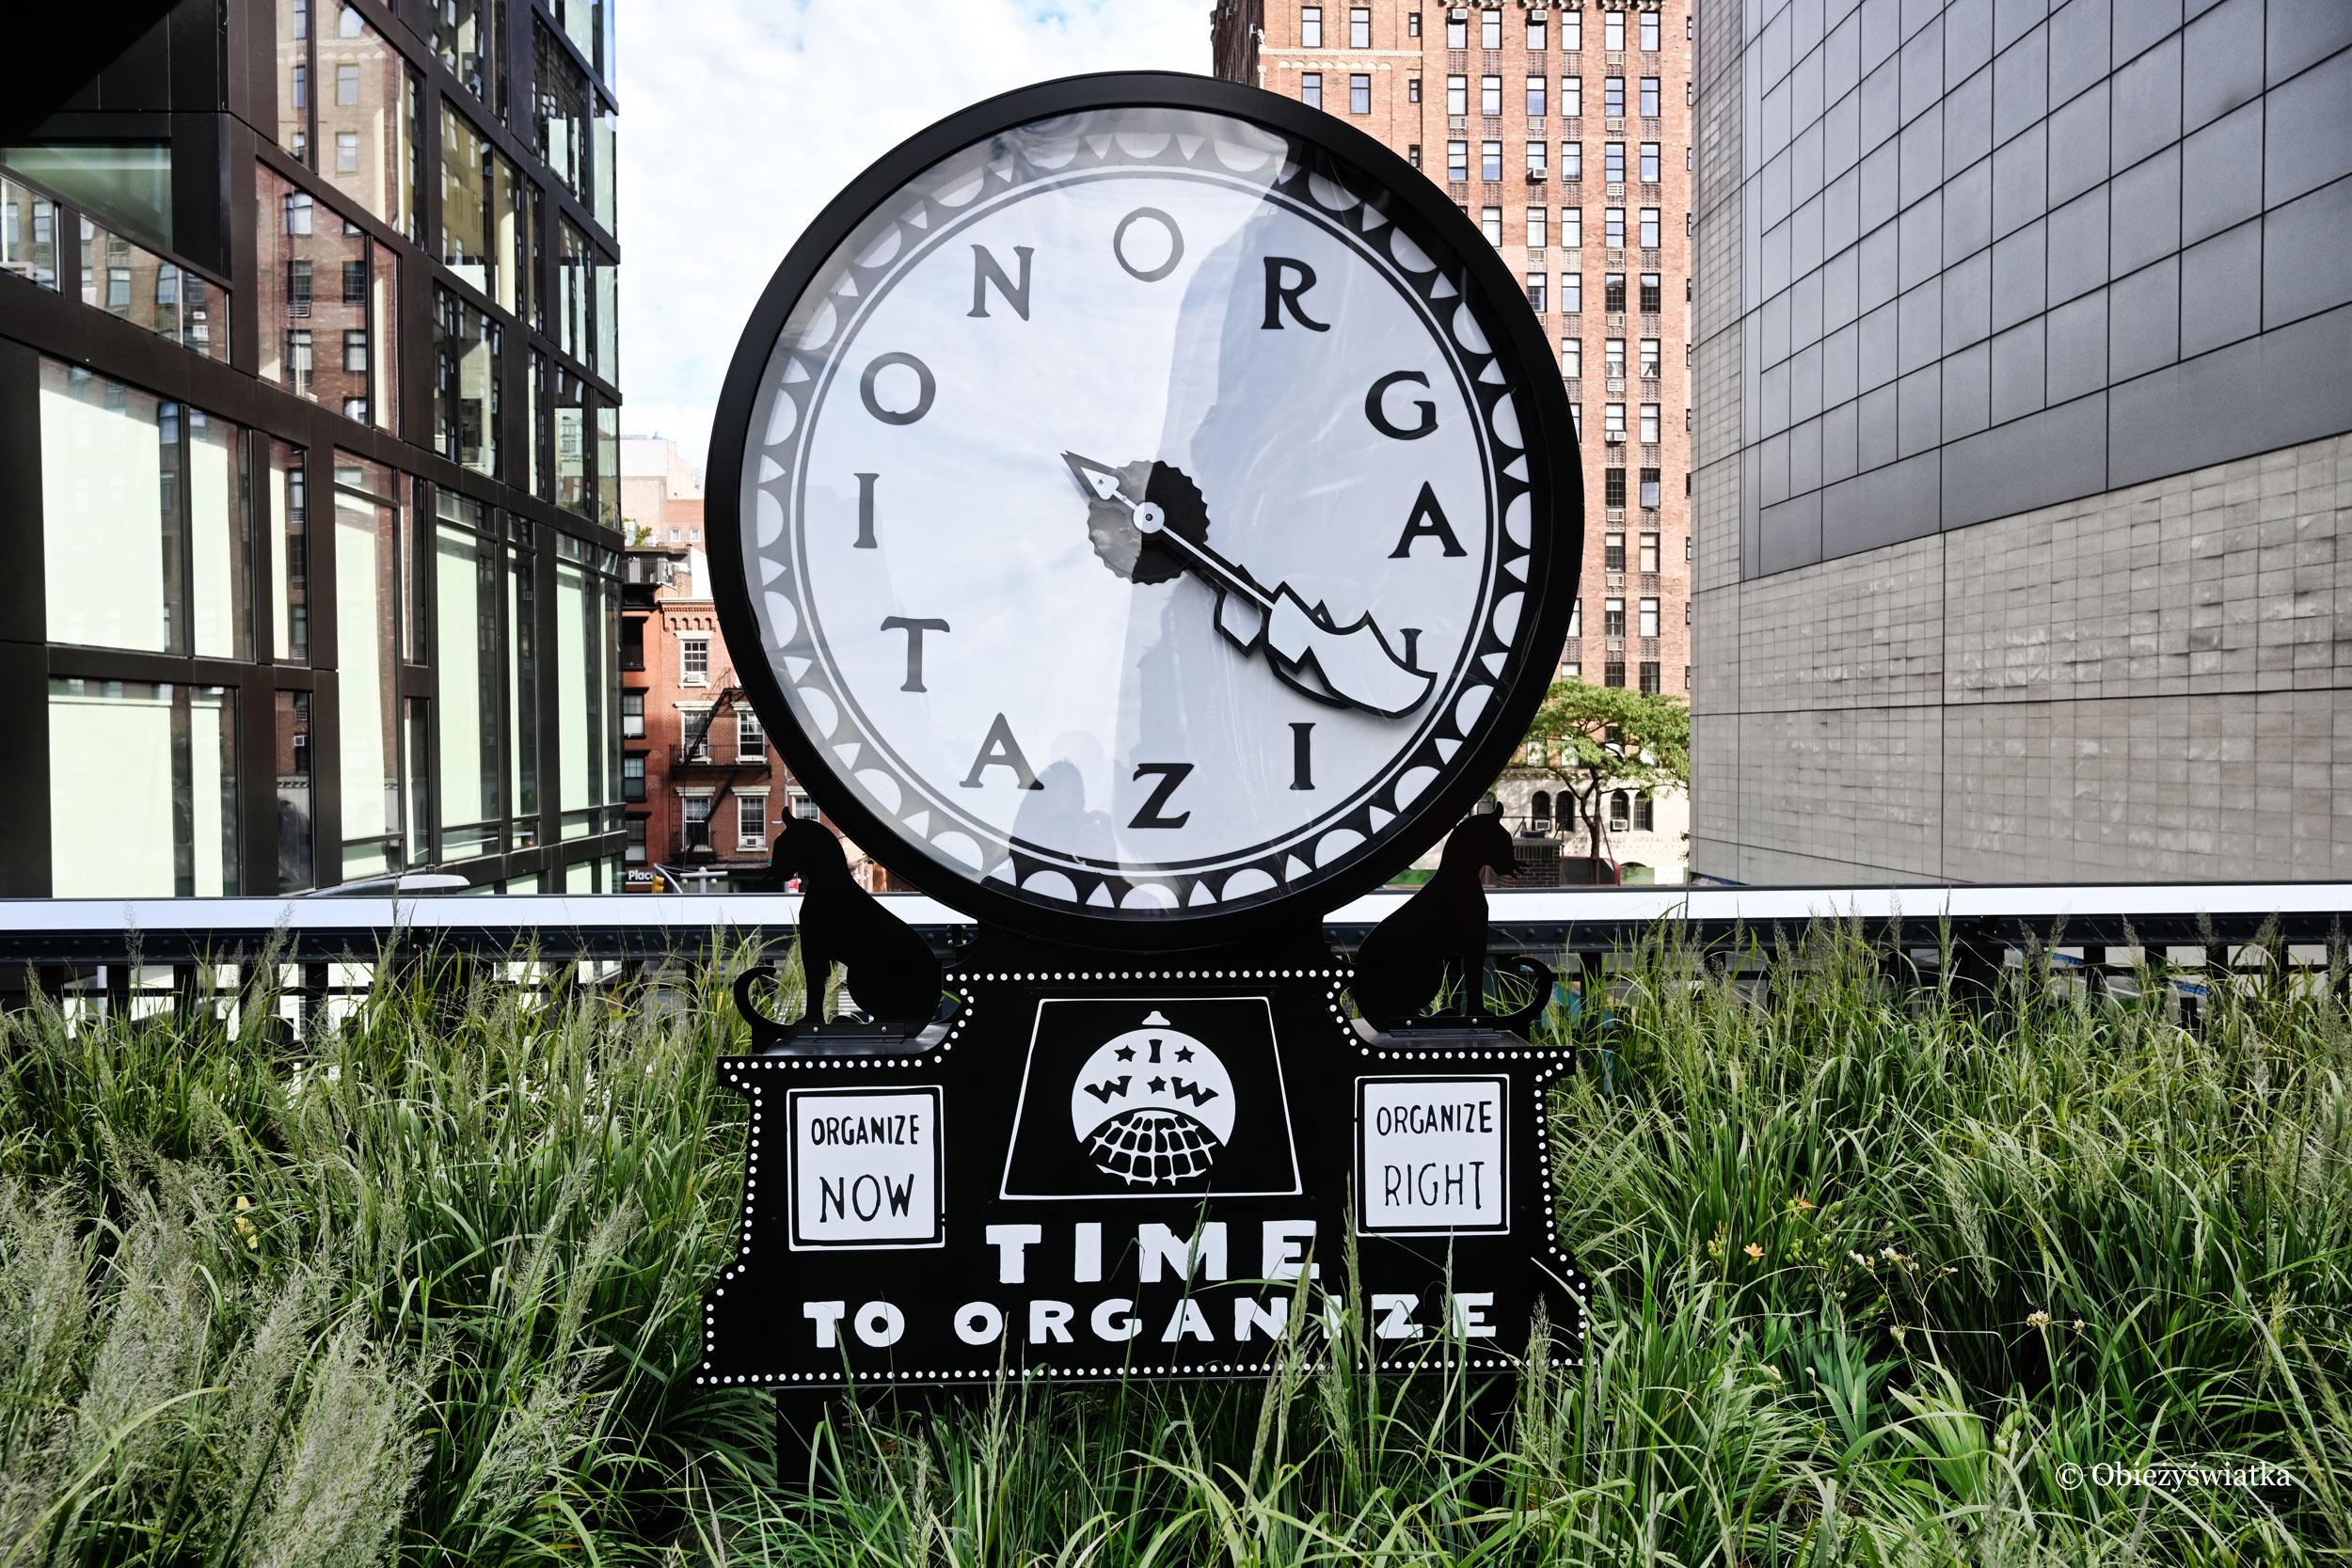 W parku The High Line, Nowy Jork - Silent Agitator autorstwa Ruth Ewan